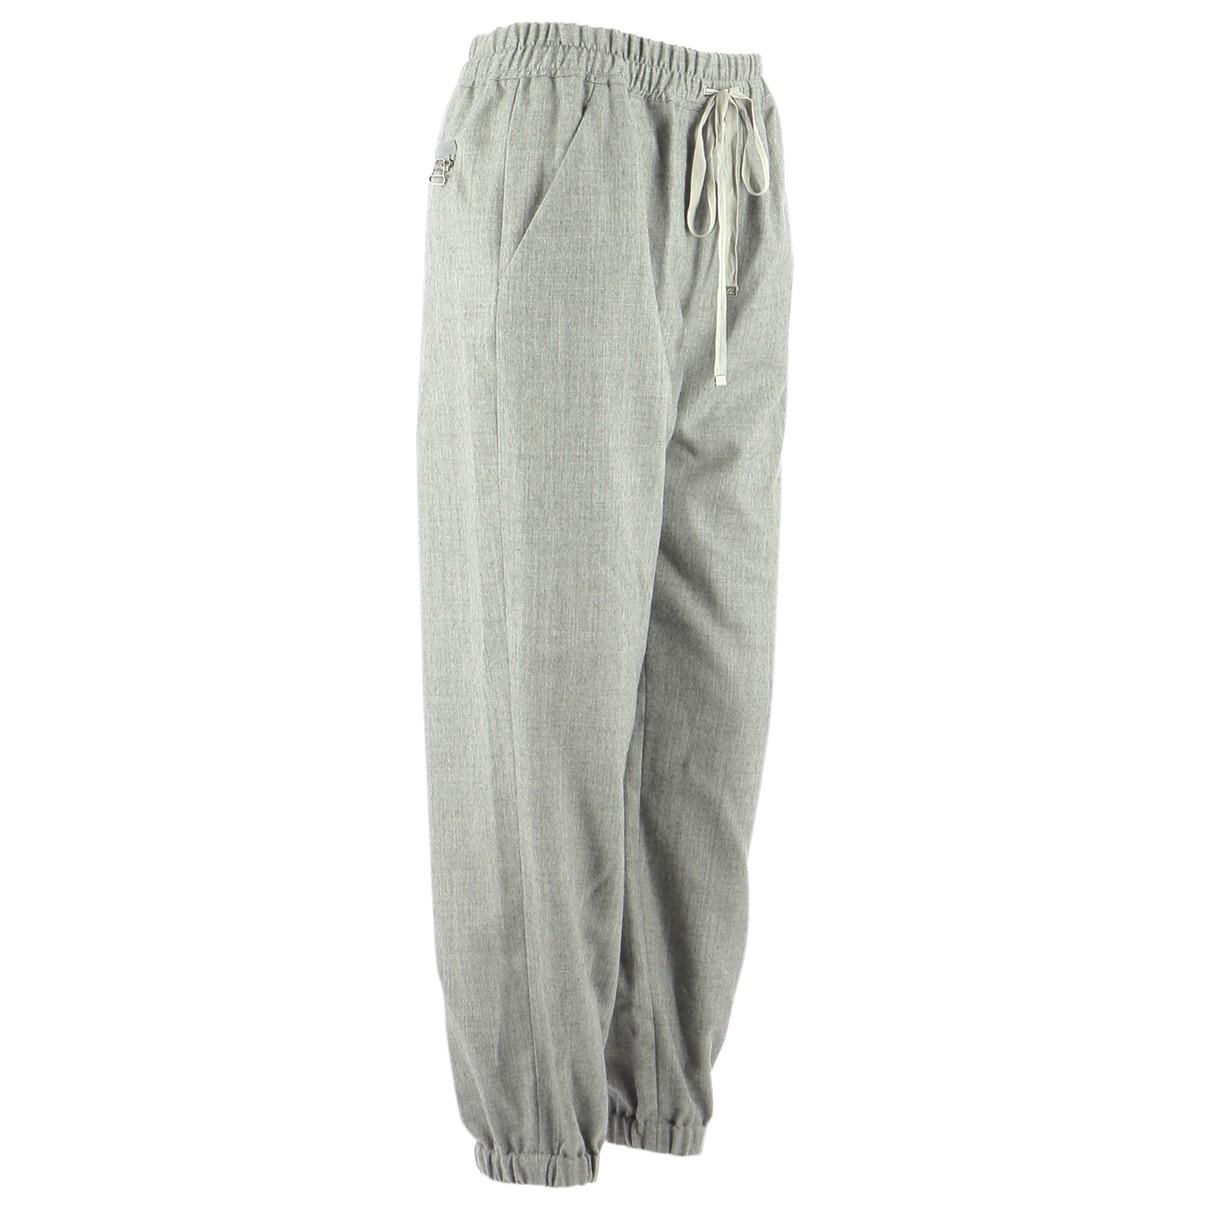 3.1 Phillip Lim \N Grey Wool Trousers for Women 2